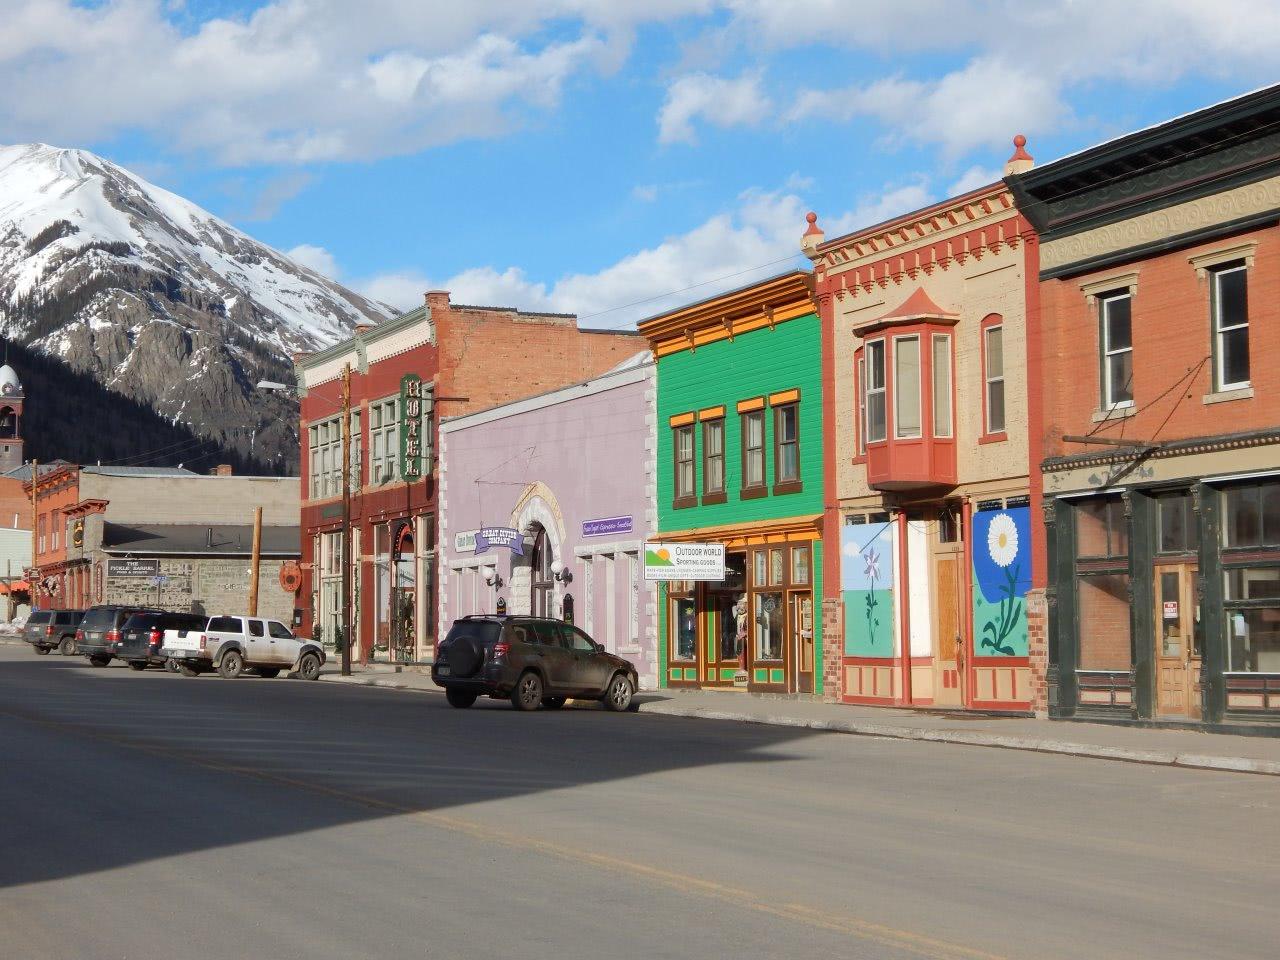 Winterreise Yellowstone – Personal Scout Tours